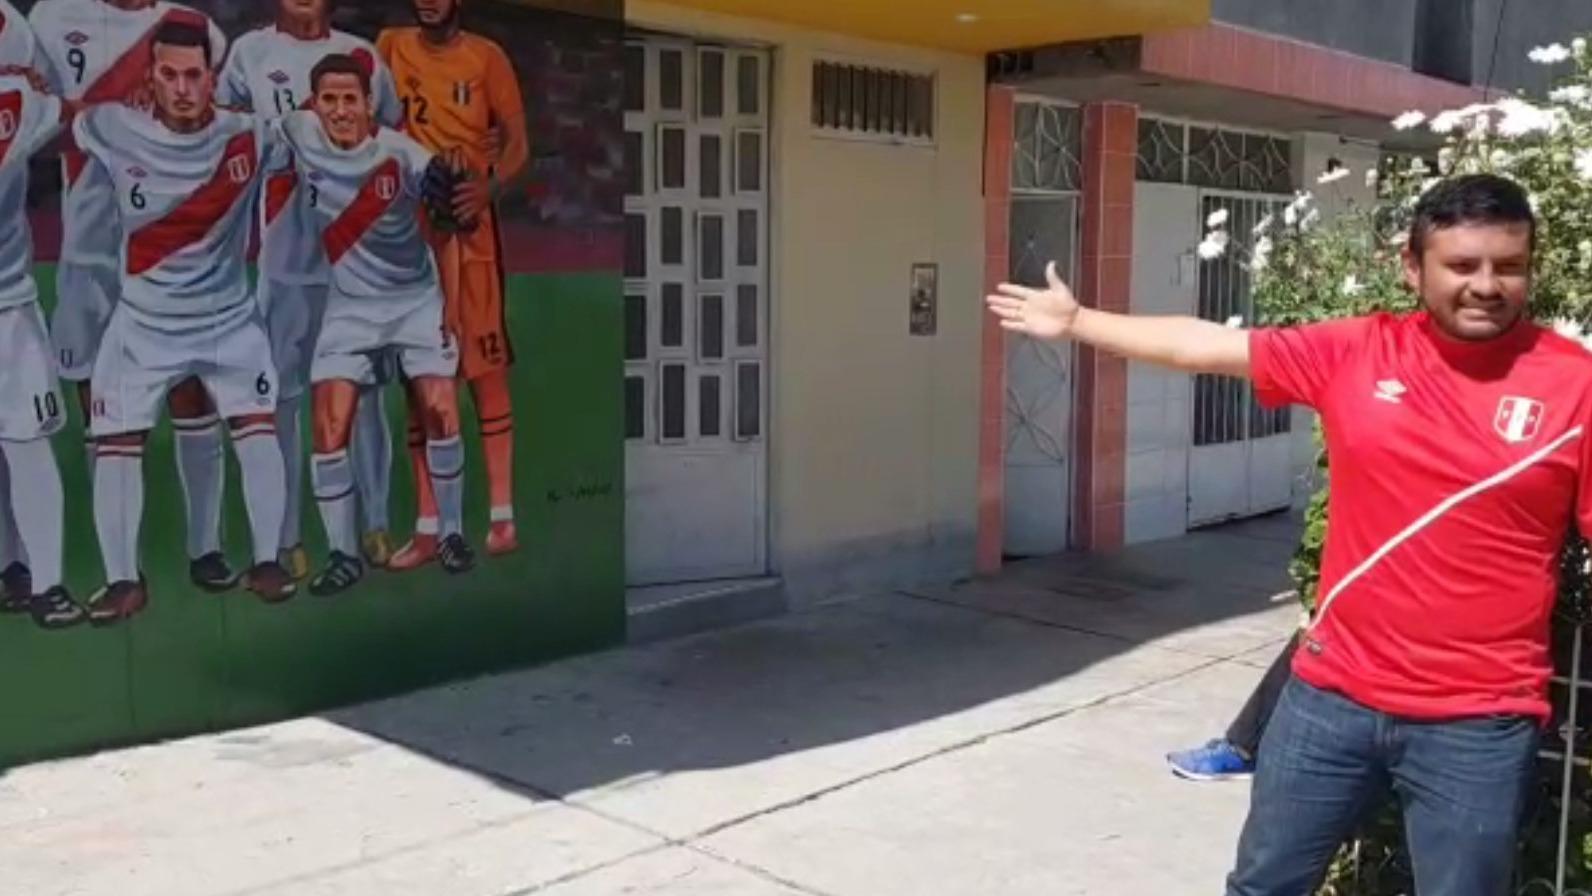 Pillpe Morales narró a RPP Noticias que el mural tardó cerca de 15 días en ser elaborado.